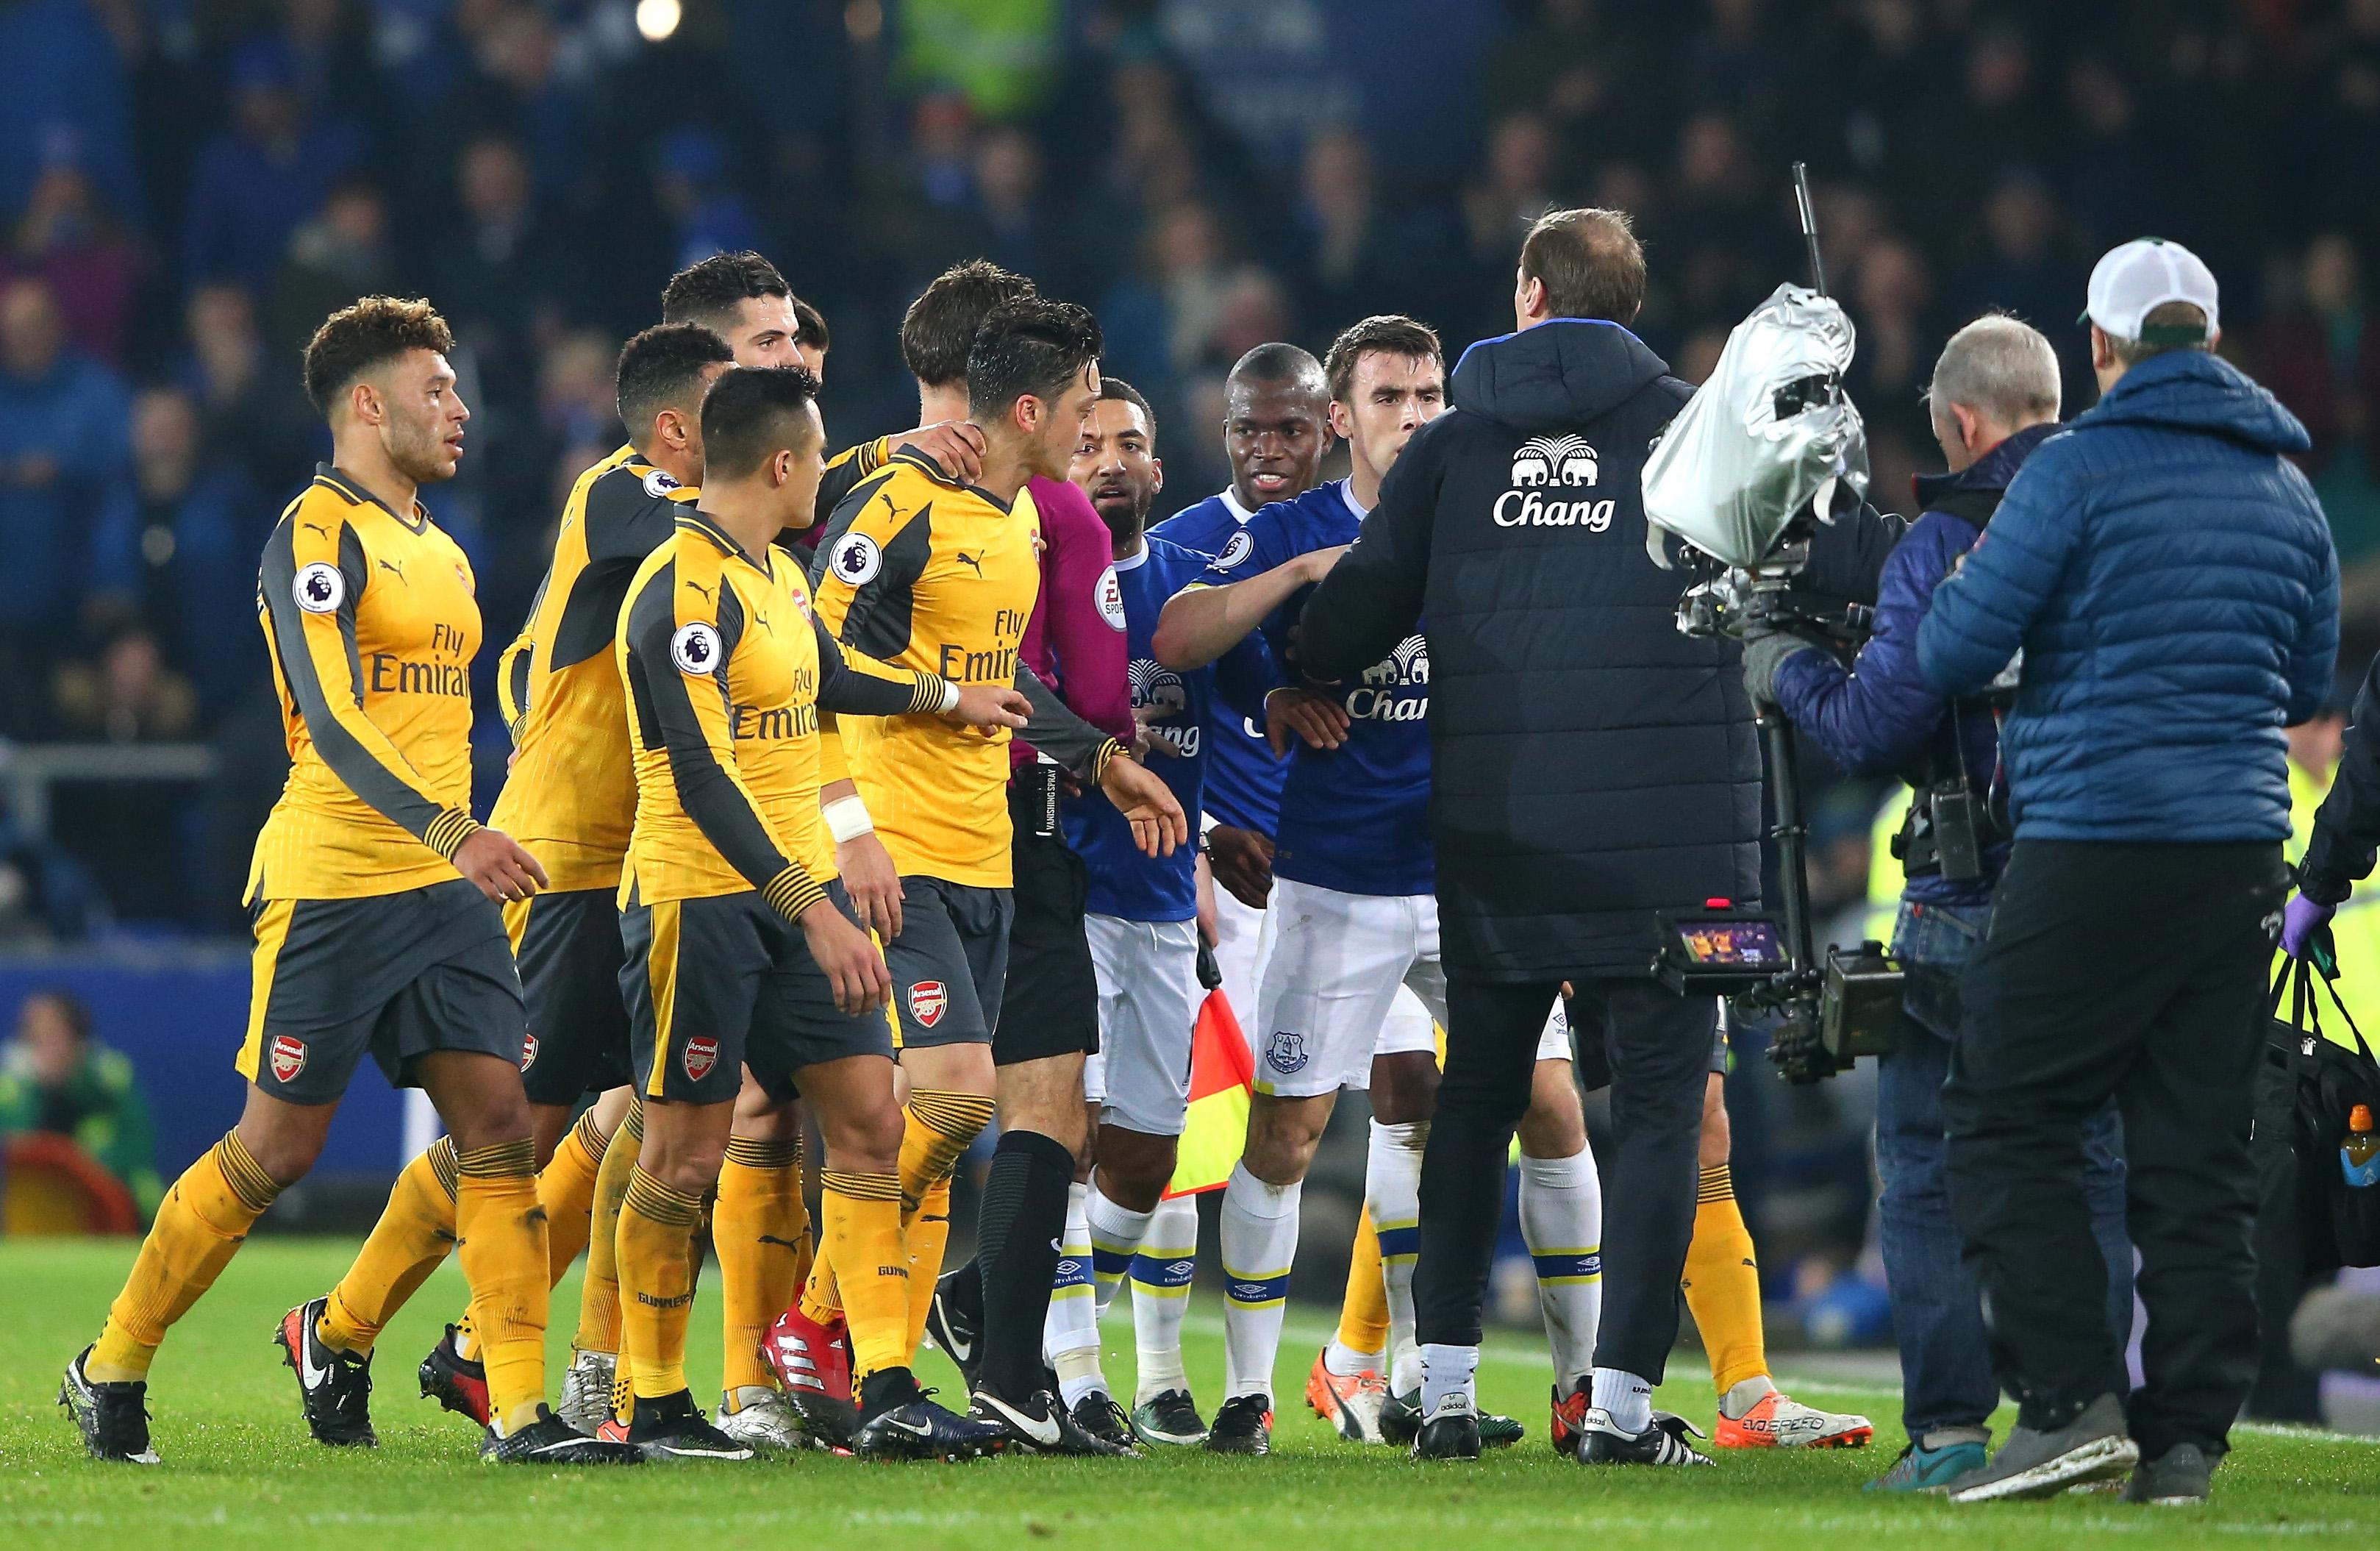 Everton 2-1 Arsenal player ratings: Theo Walcott flops as Ronald Koeman's side fight back